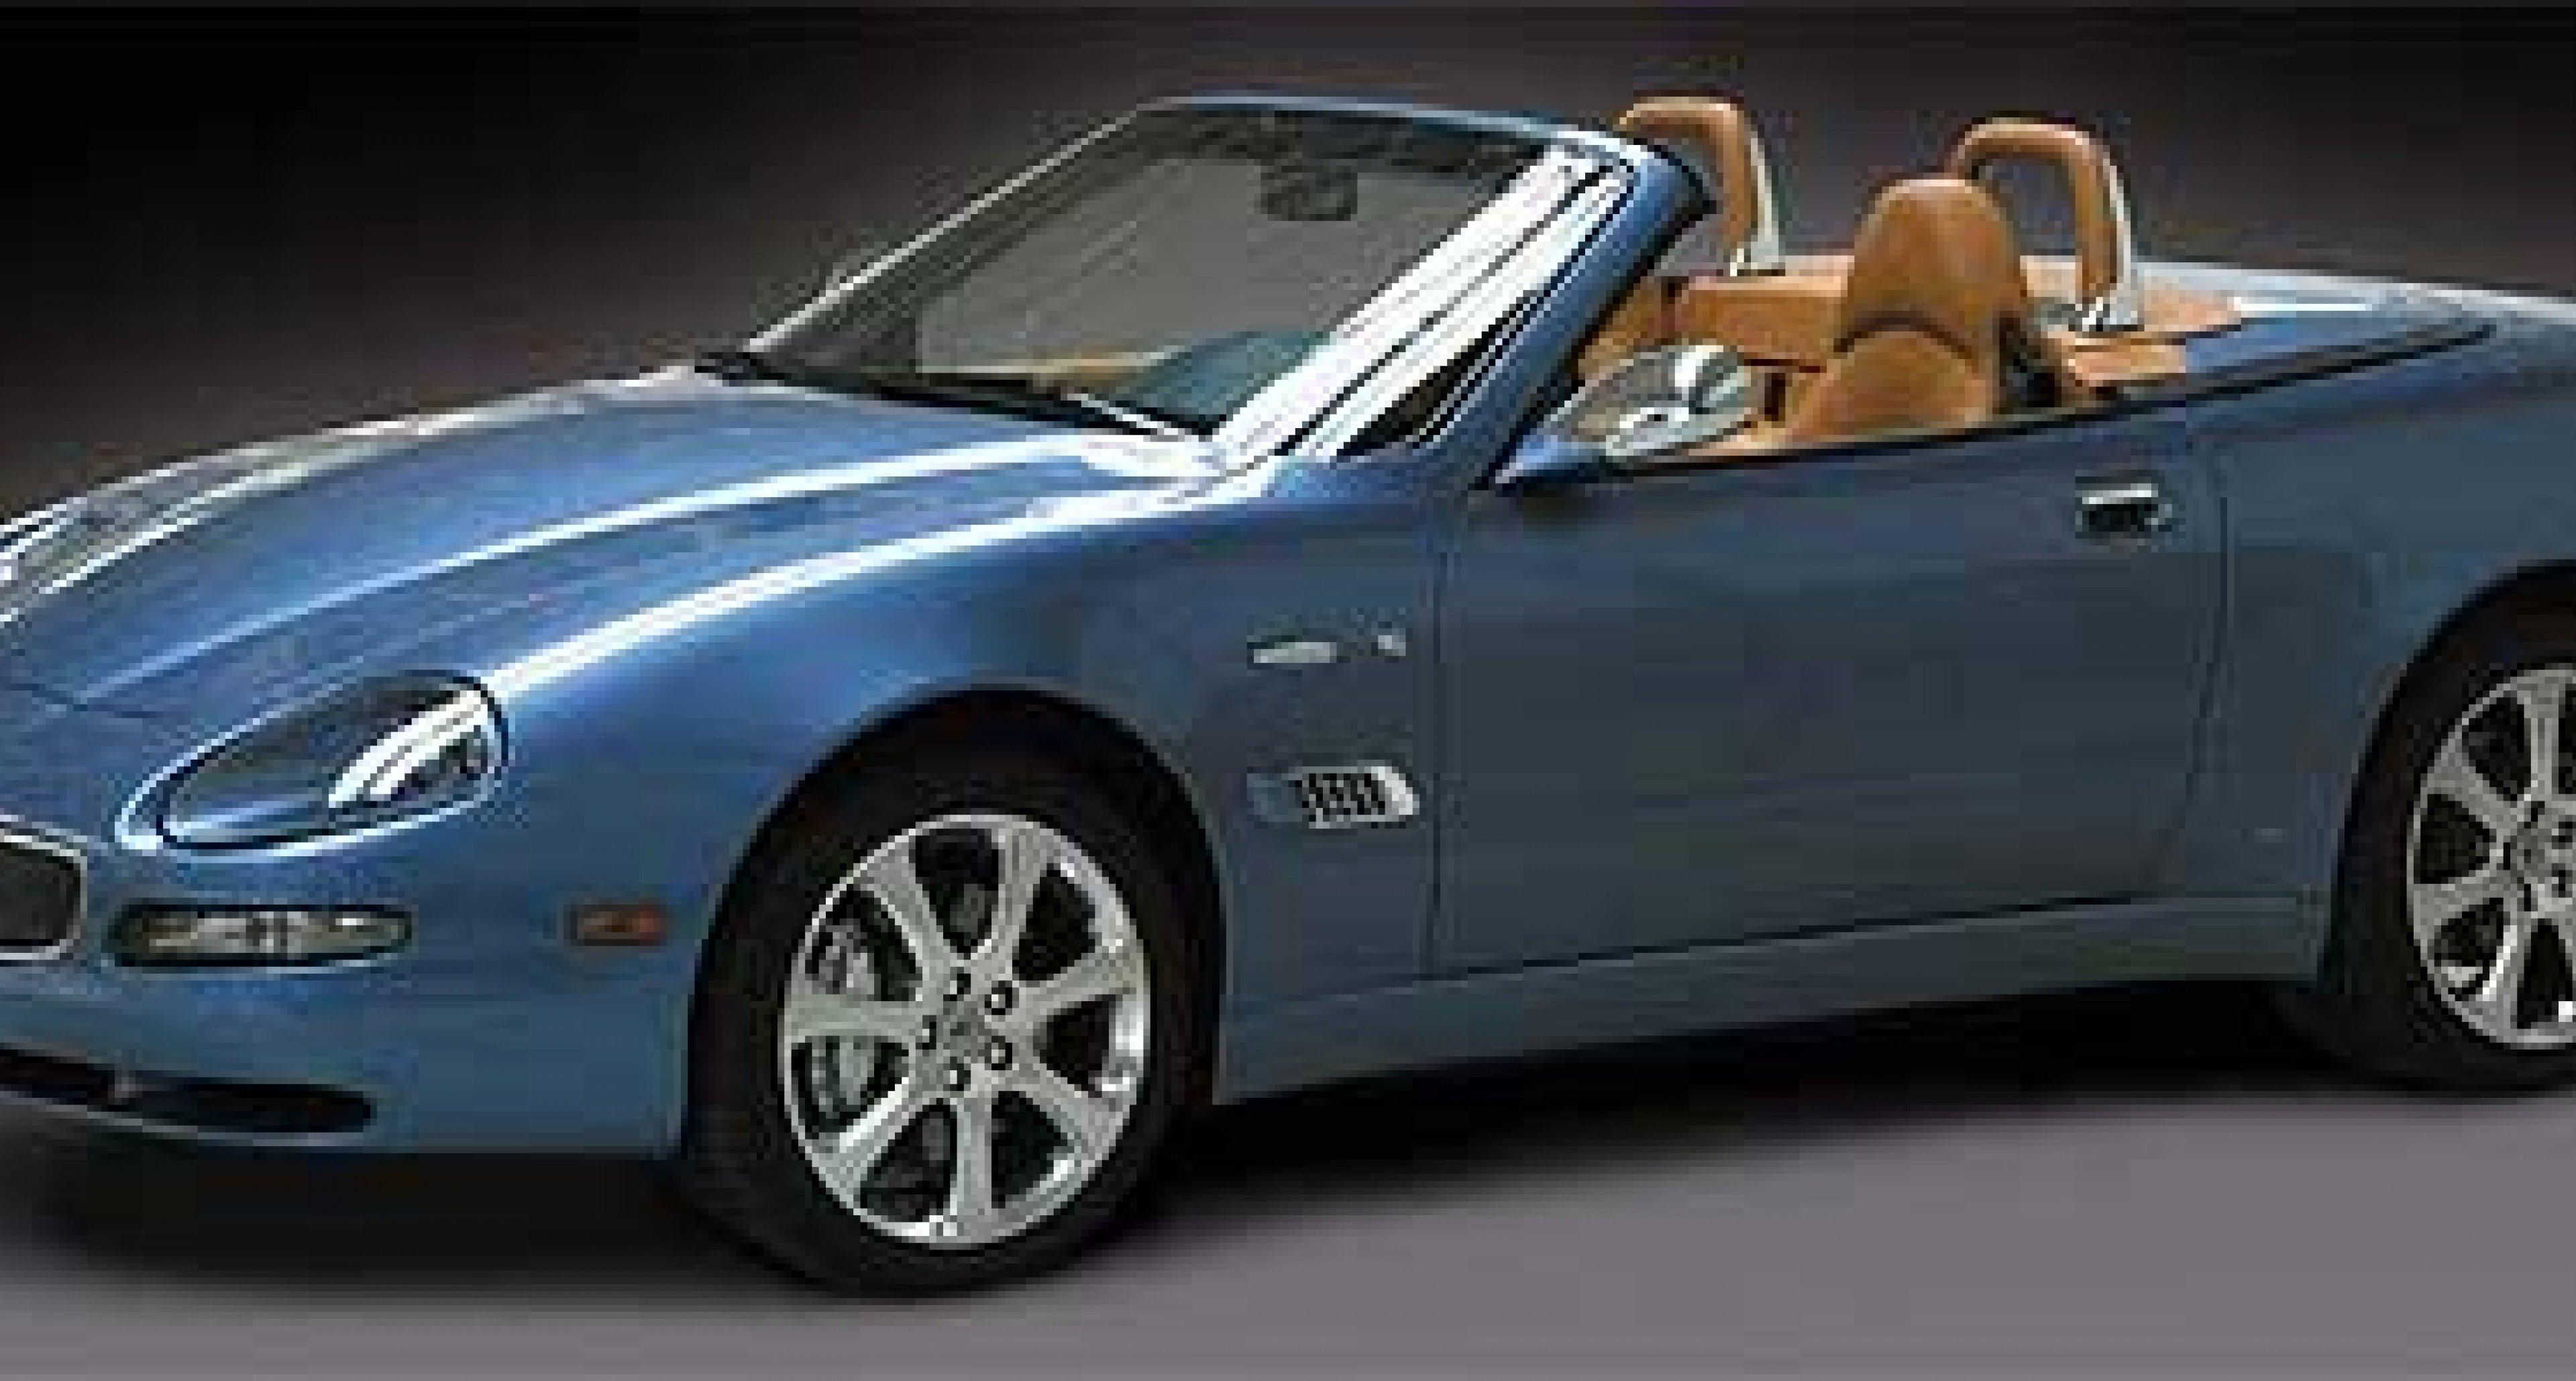 Vintage Personalization Program for Maserati Spyder